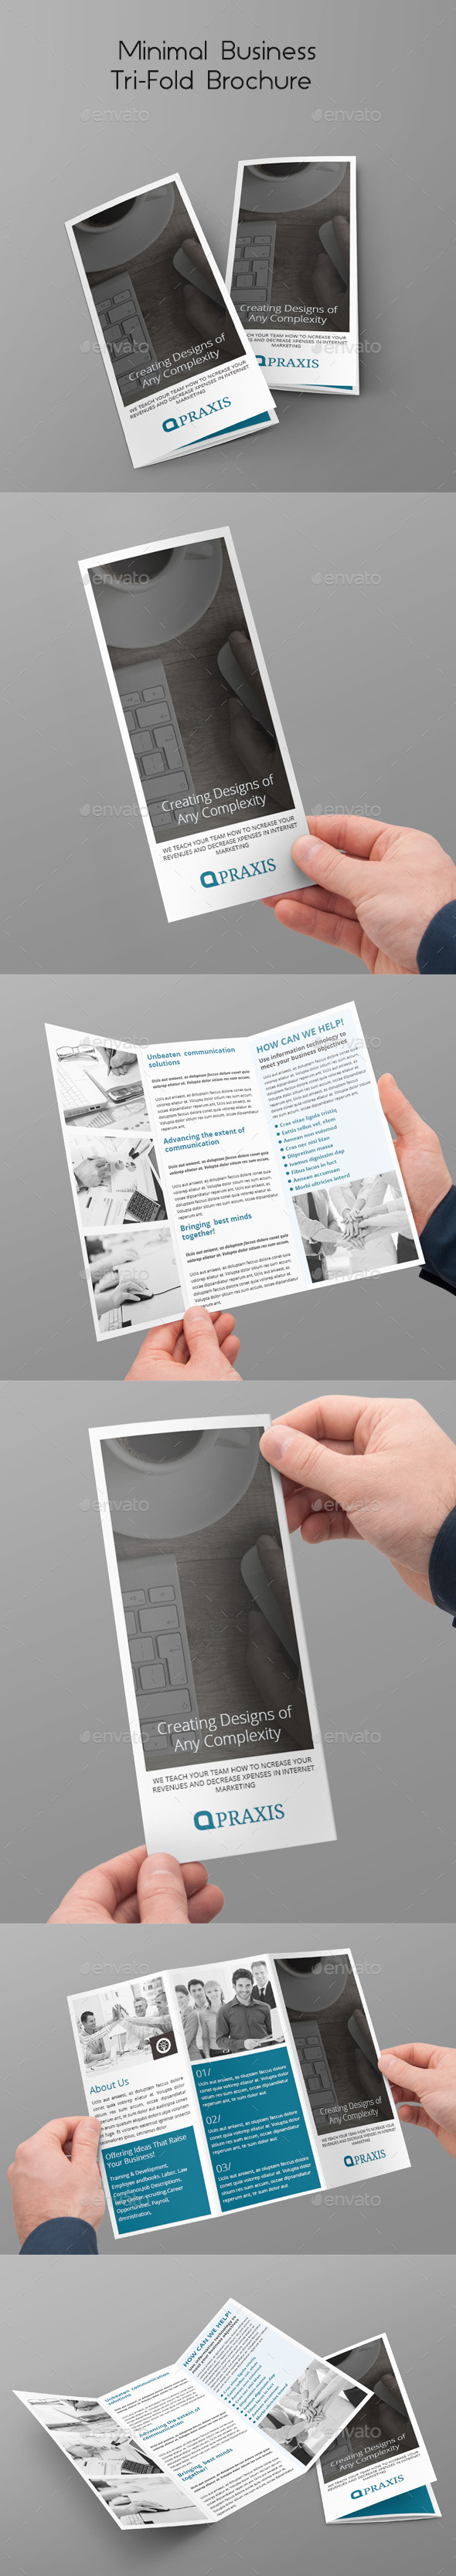 GraphicRiver Minimal Business Tri-Fold Brochure 10444081